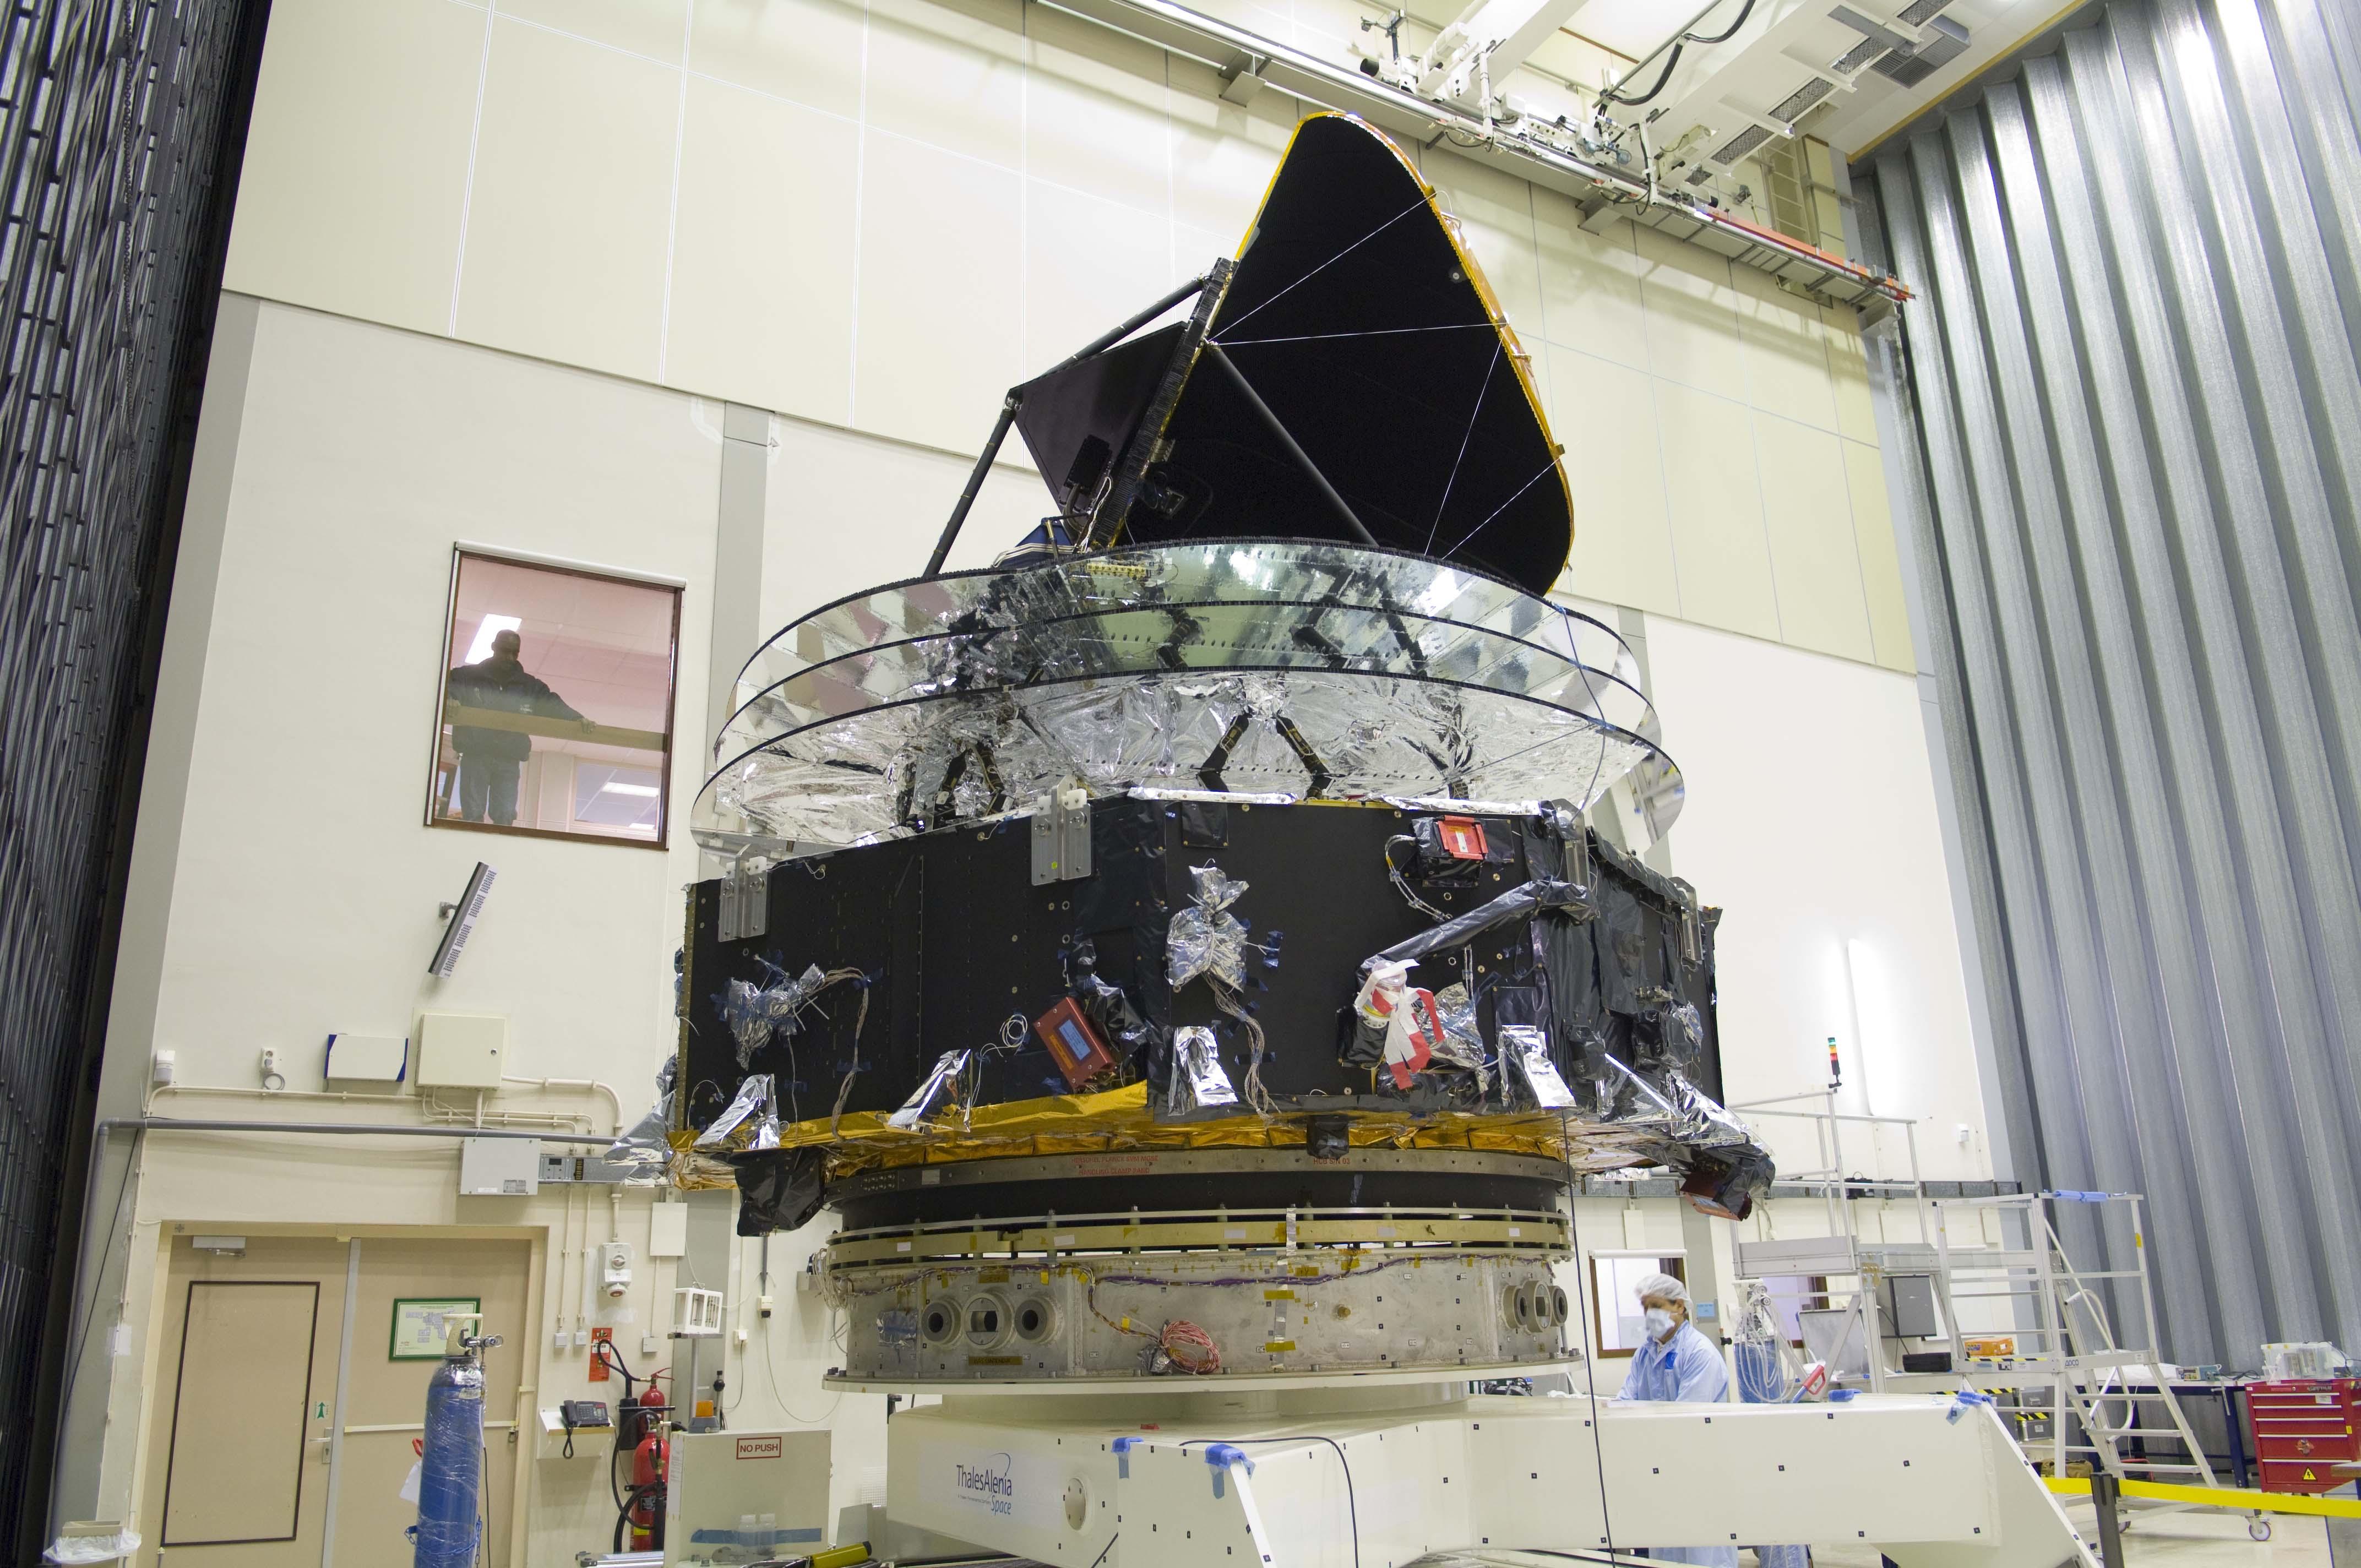 1567217795320-Planck-spacecraft__ID_Pavo2008-1335.JPG